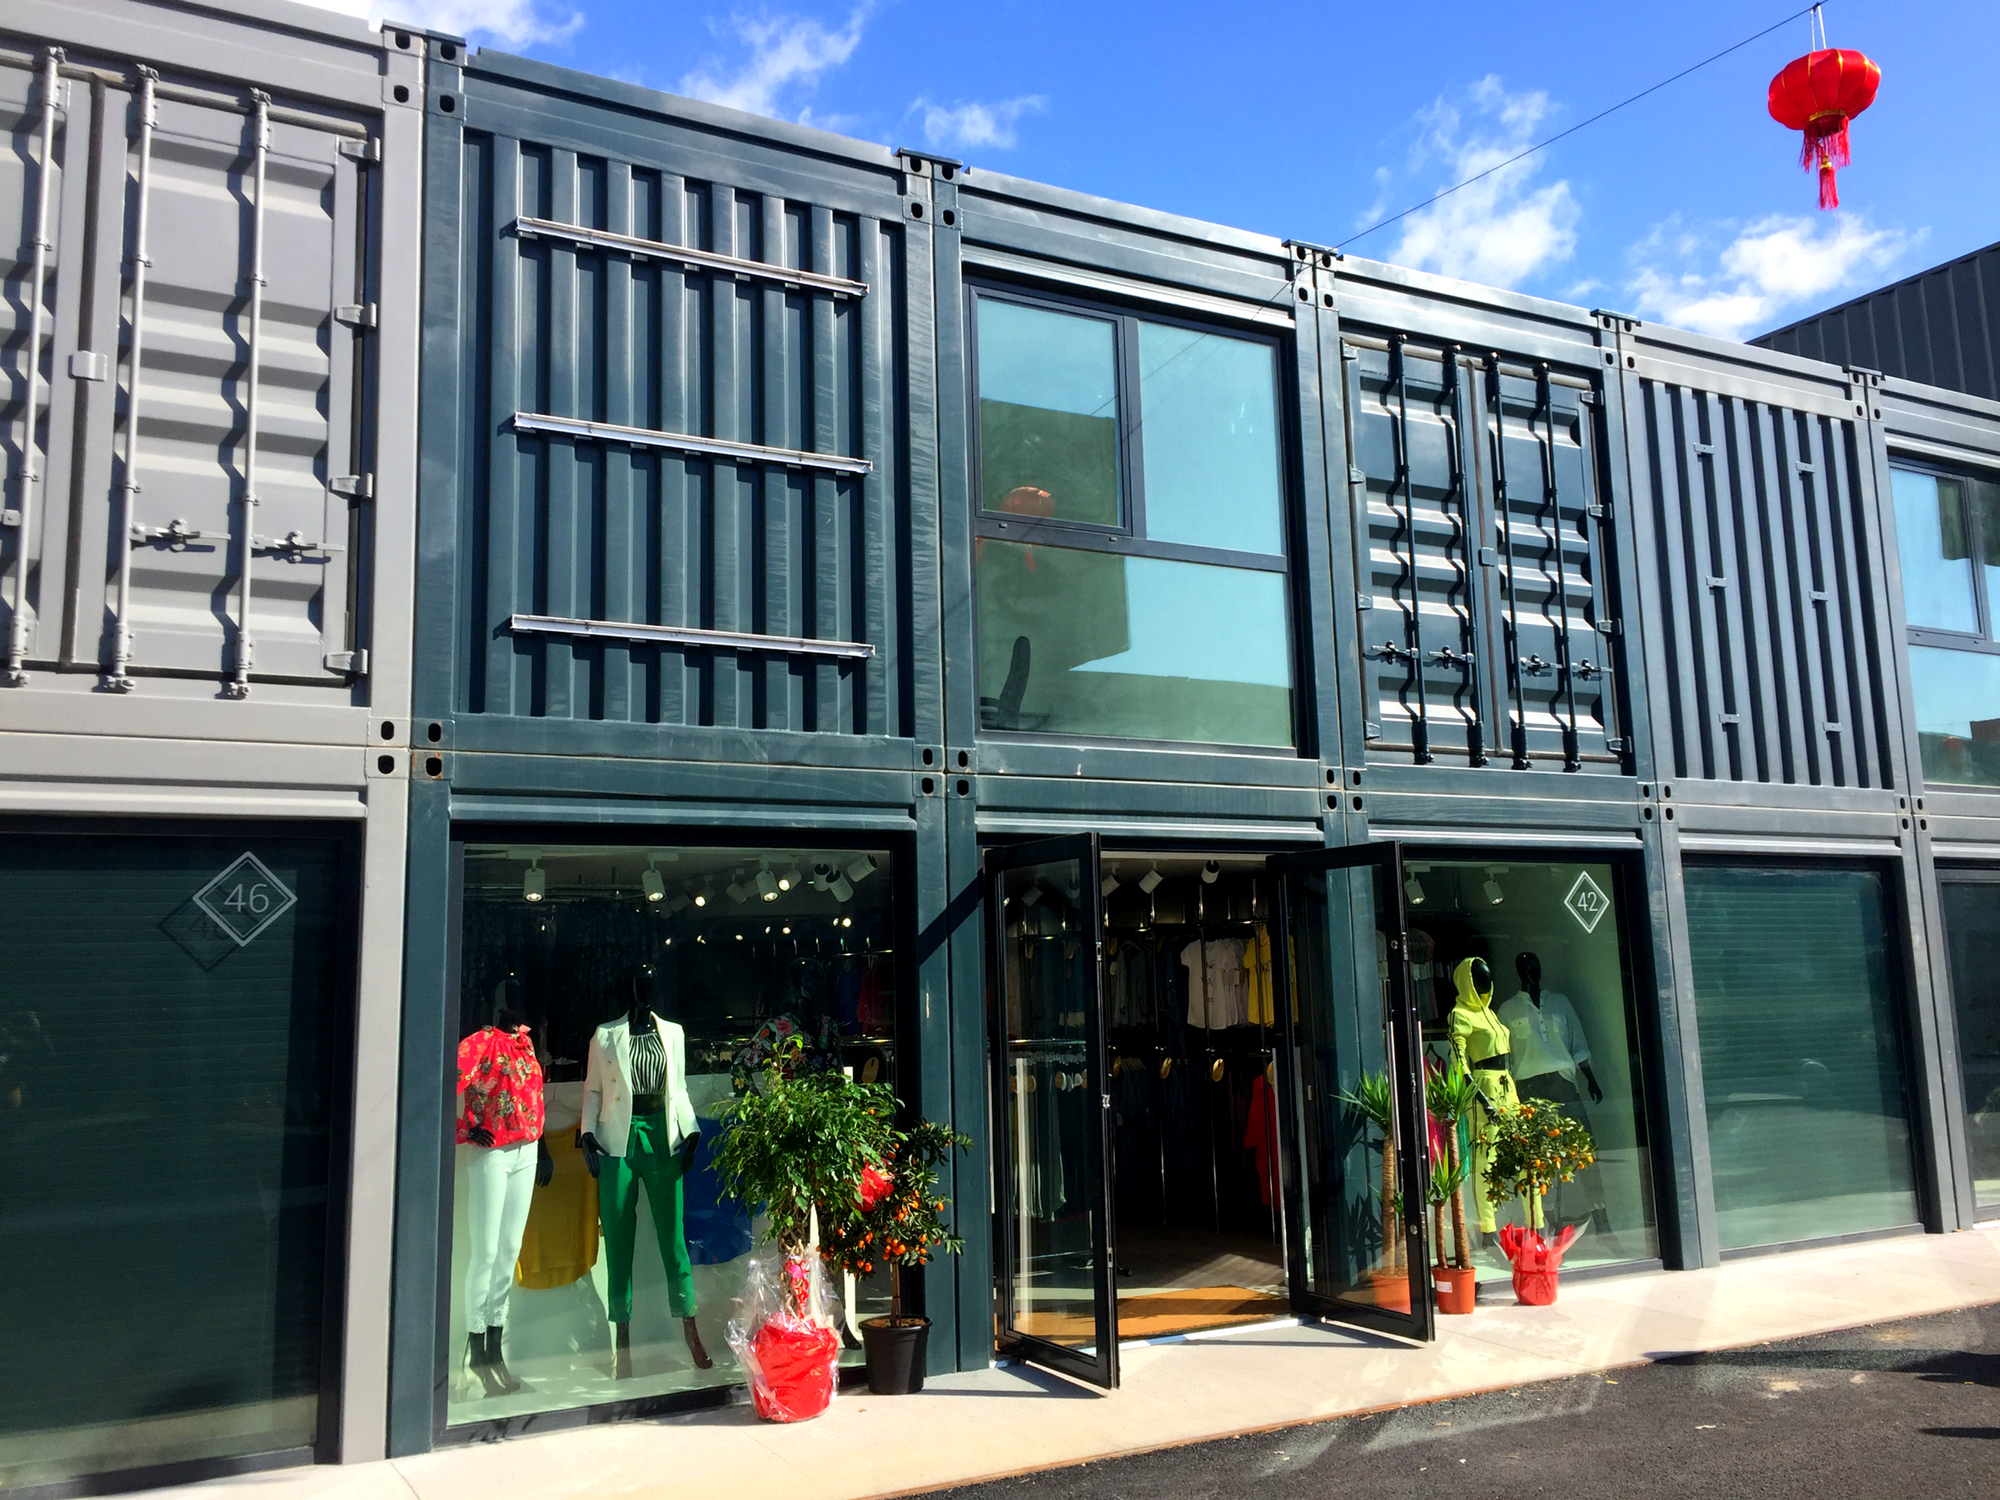 MIF68 - Marseilles International Fashion Centre